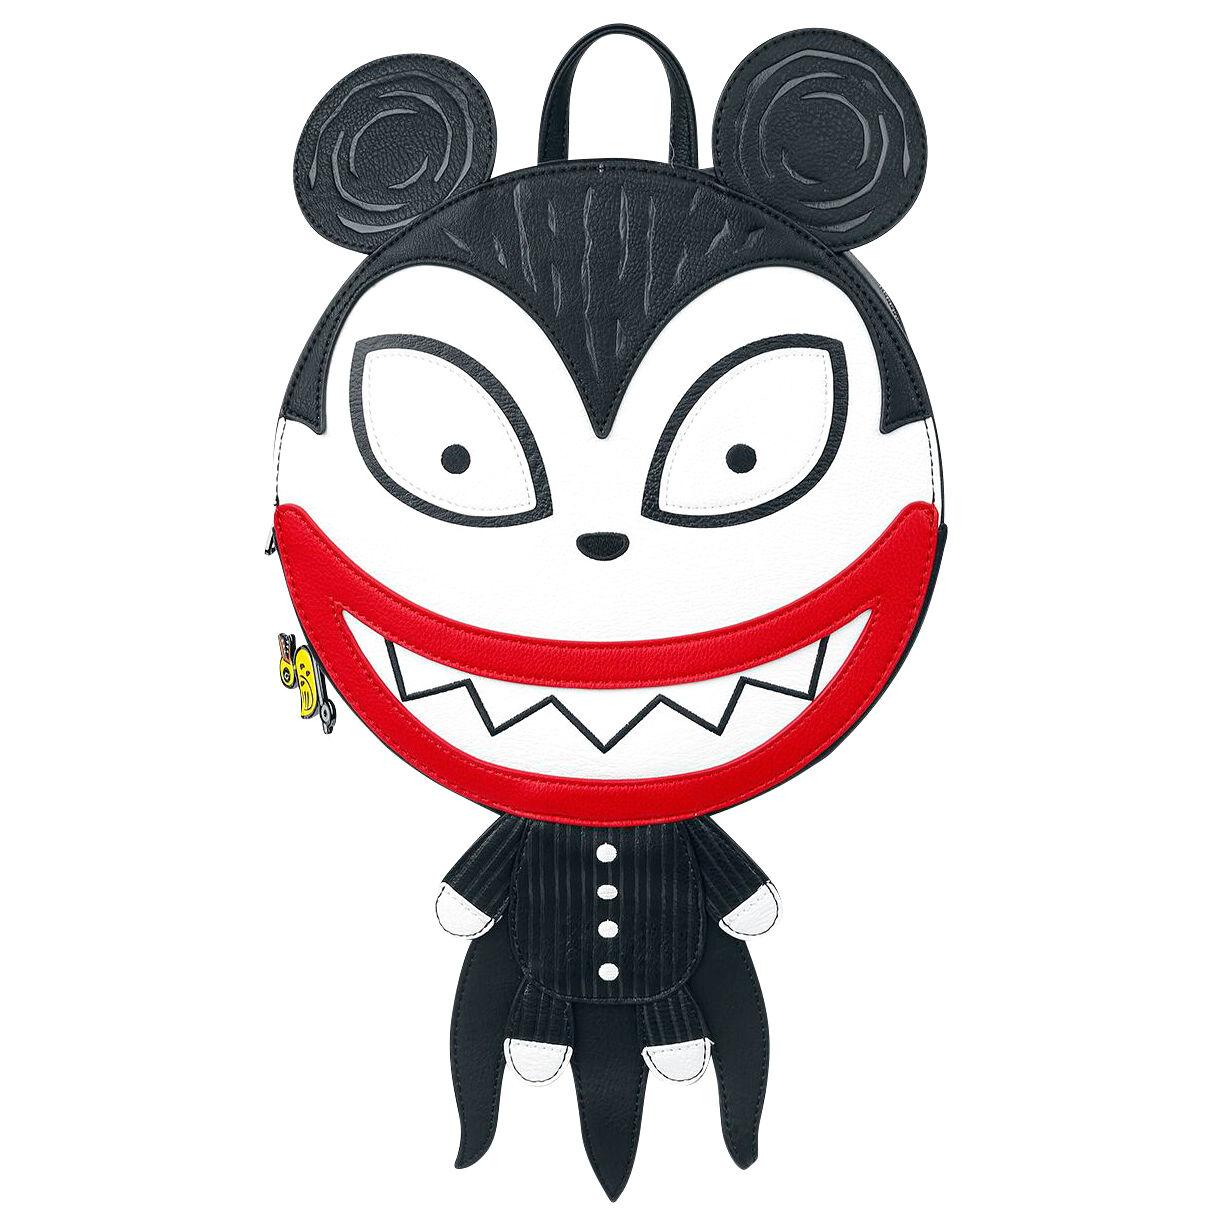 Mochila Vampire Teddy Nightmare Before Christmas Disney 44cm 671803297975